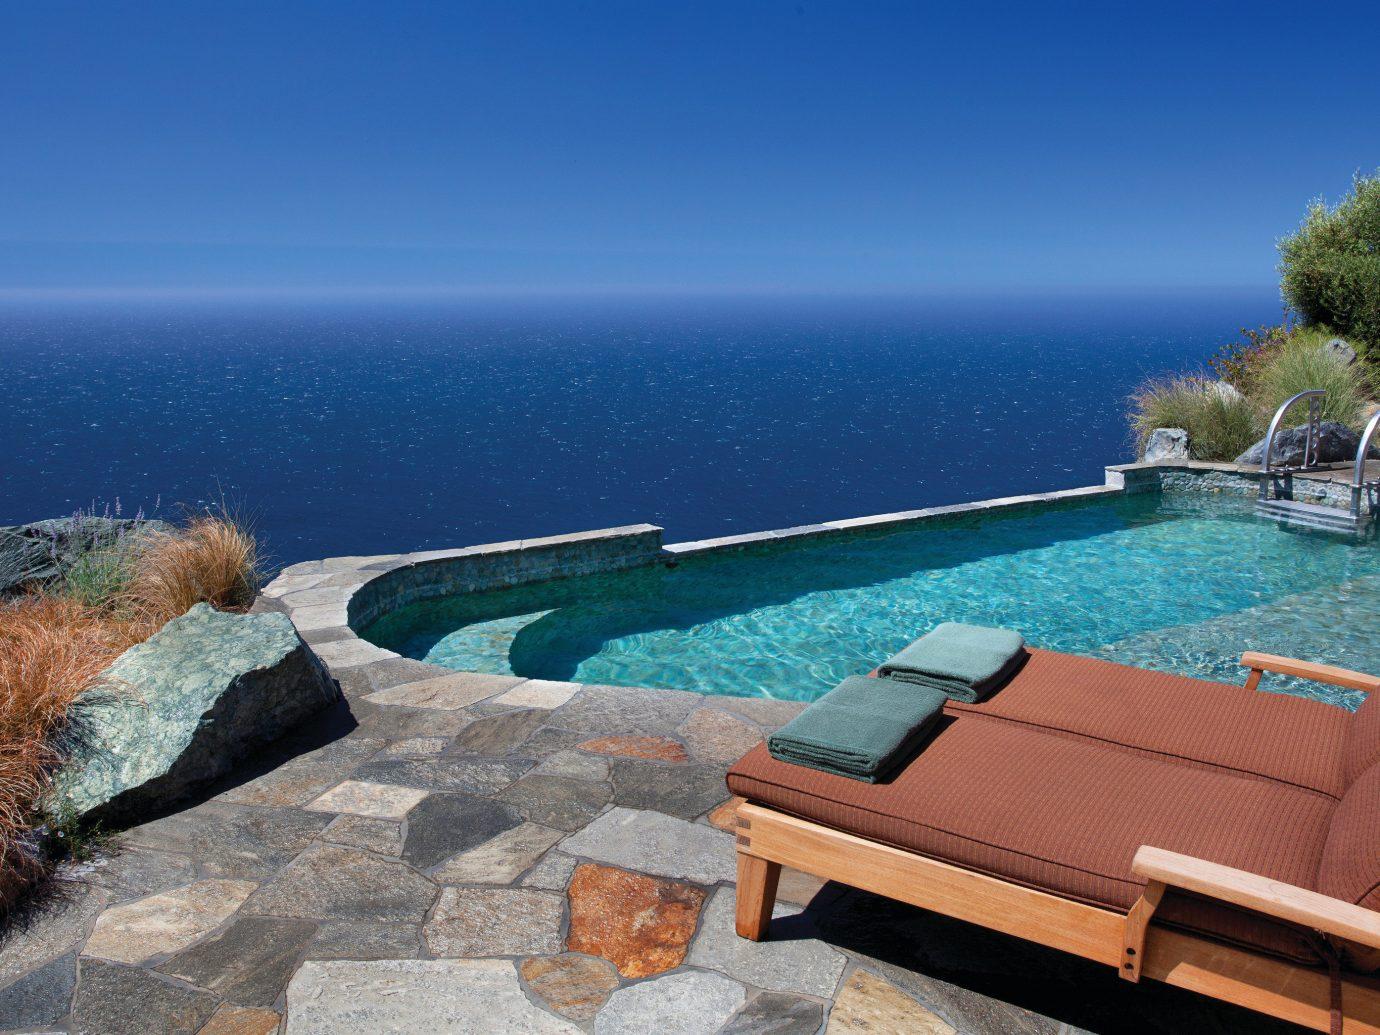 Trip Ideas water sky outdoor swimming pool property Sea Nature vacation Ocean estate Coast bay Villa Resort overlooking